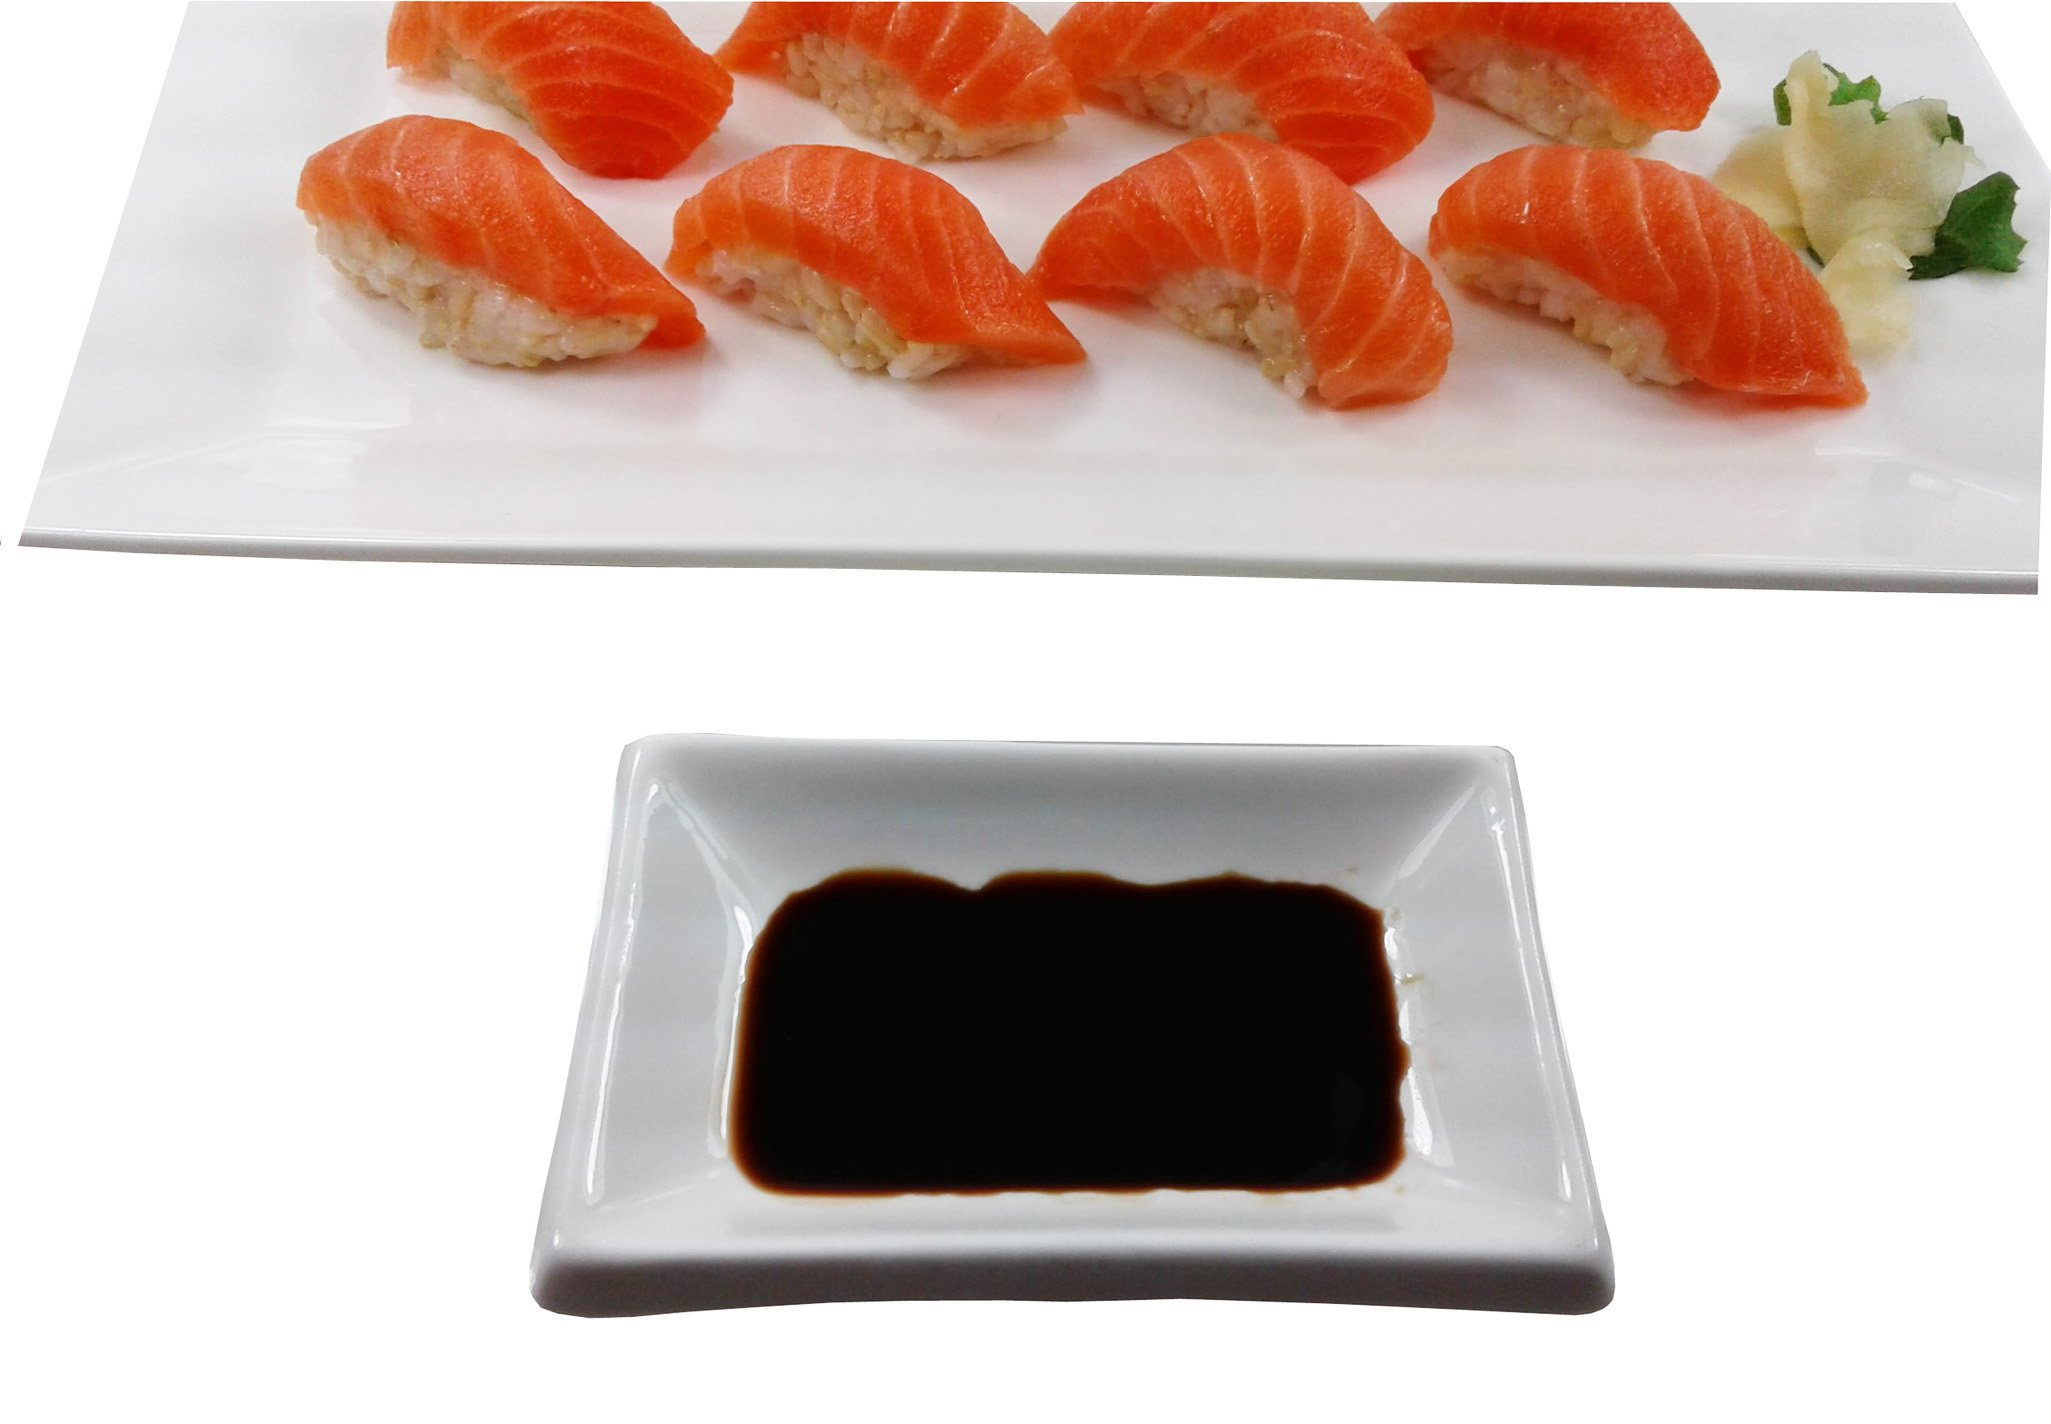 4'' White Rectangular Porcelain Sauce Dish - Great for Soy Sauce, Wasabi, Hot sauce (1 DZ)